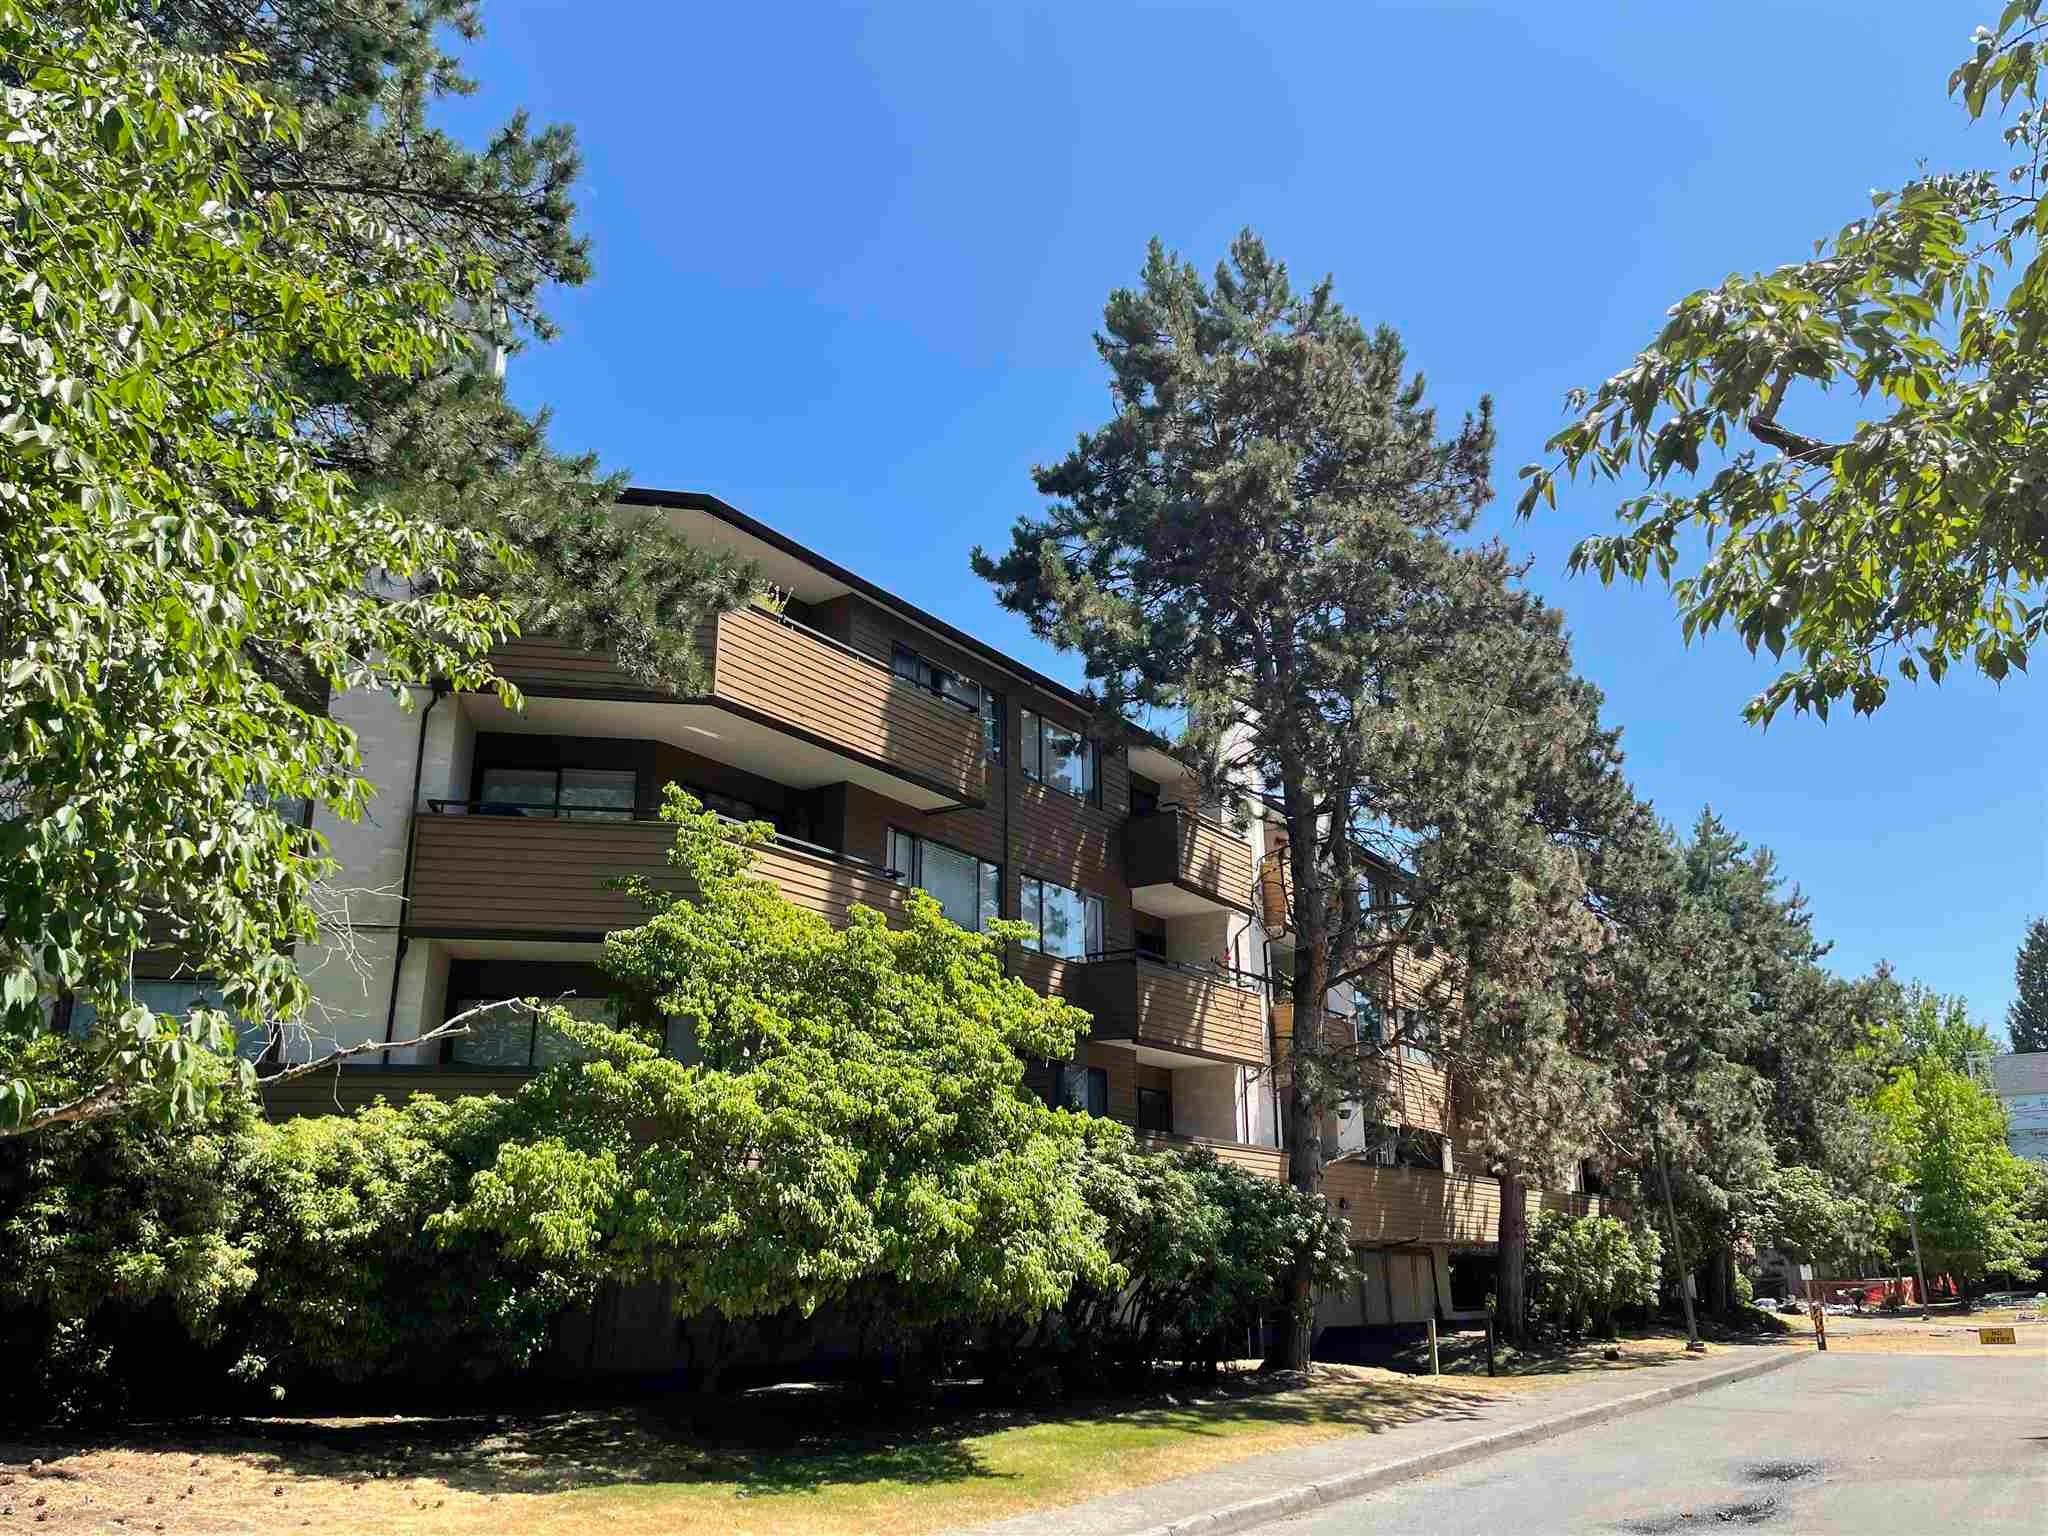 230 7297 MOFFATT ROAD - Brighouse South Apartment/Condo for sale, 2 Bedrooms (R2601544)